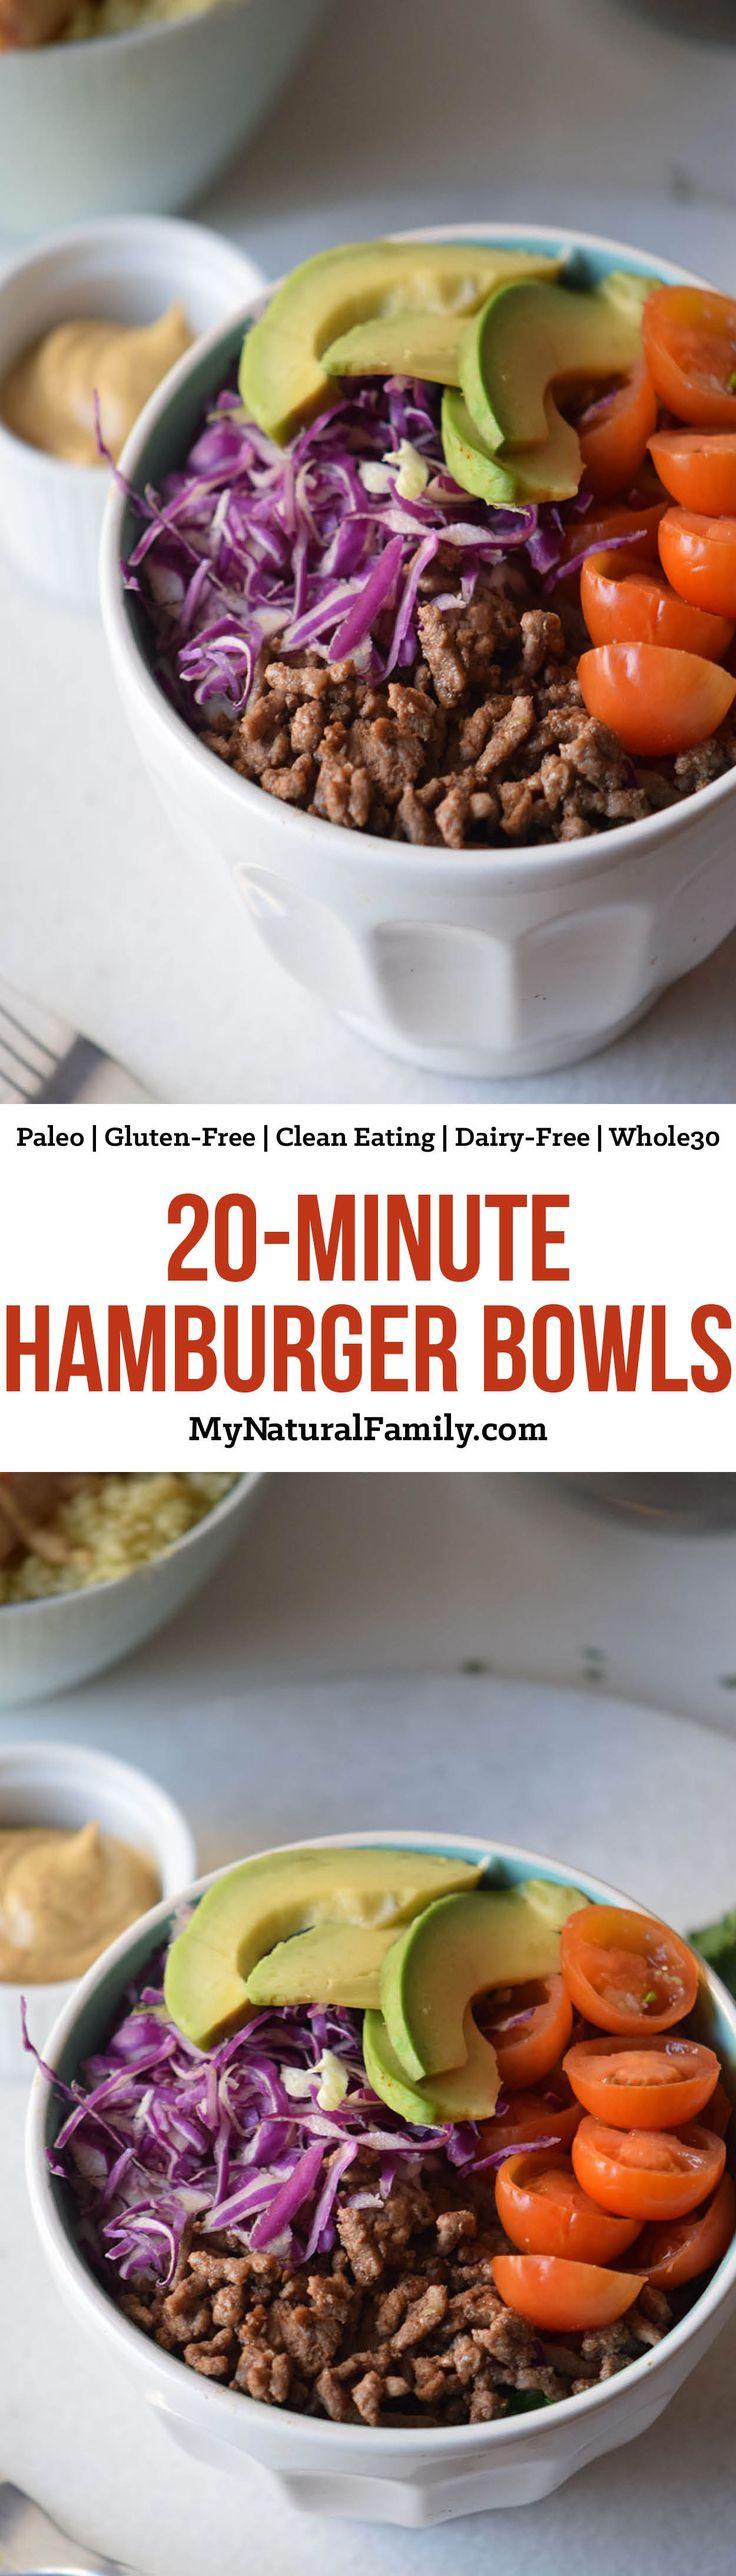 241 best best paleo dinner recipes images on pinterest fish paleo 20 minute healthy hamburger bowl recipe paleo gluten free clean eating forumfinder Gallery